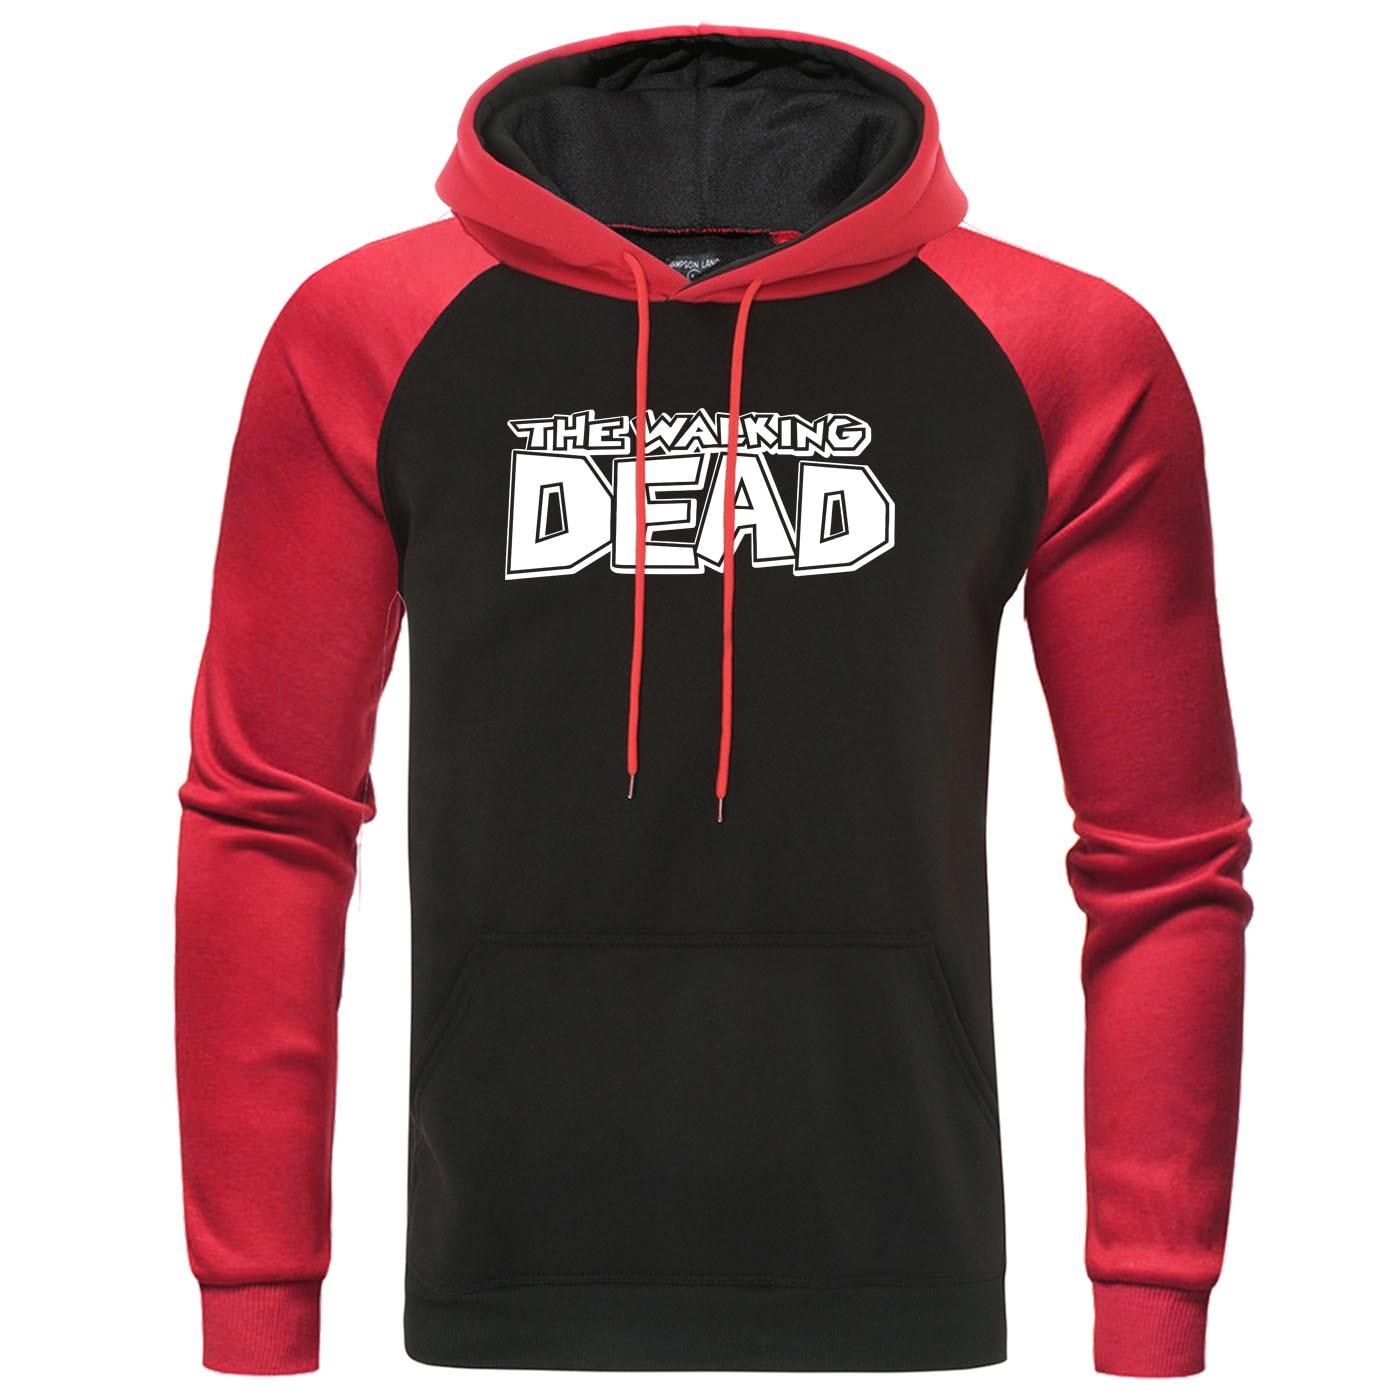 The Walking Dead Print Hoodies 2019 Autumn Winter Mens Raglan Hooded Sweatshirt Fashion Casual Men Pullover Harajuku Streetwear